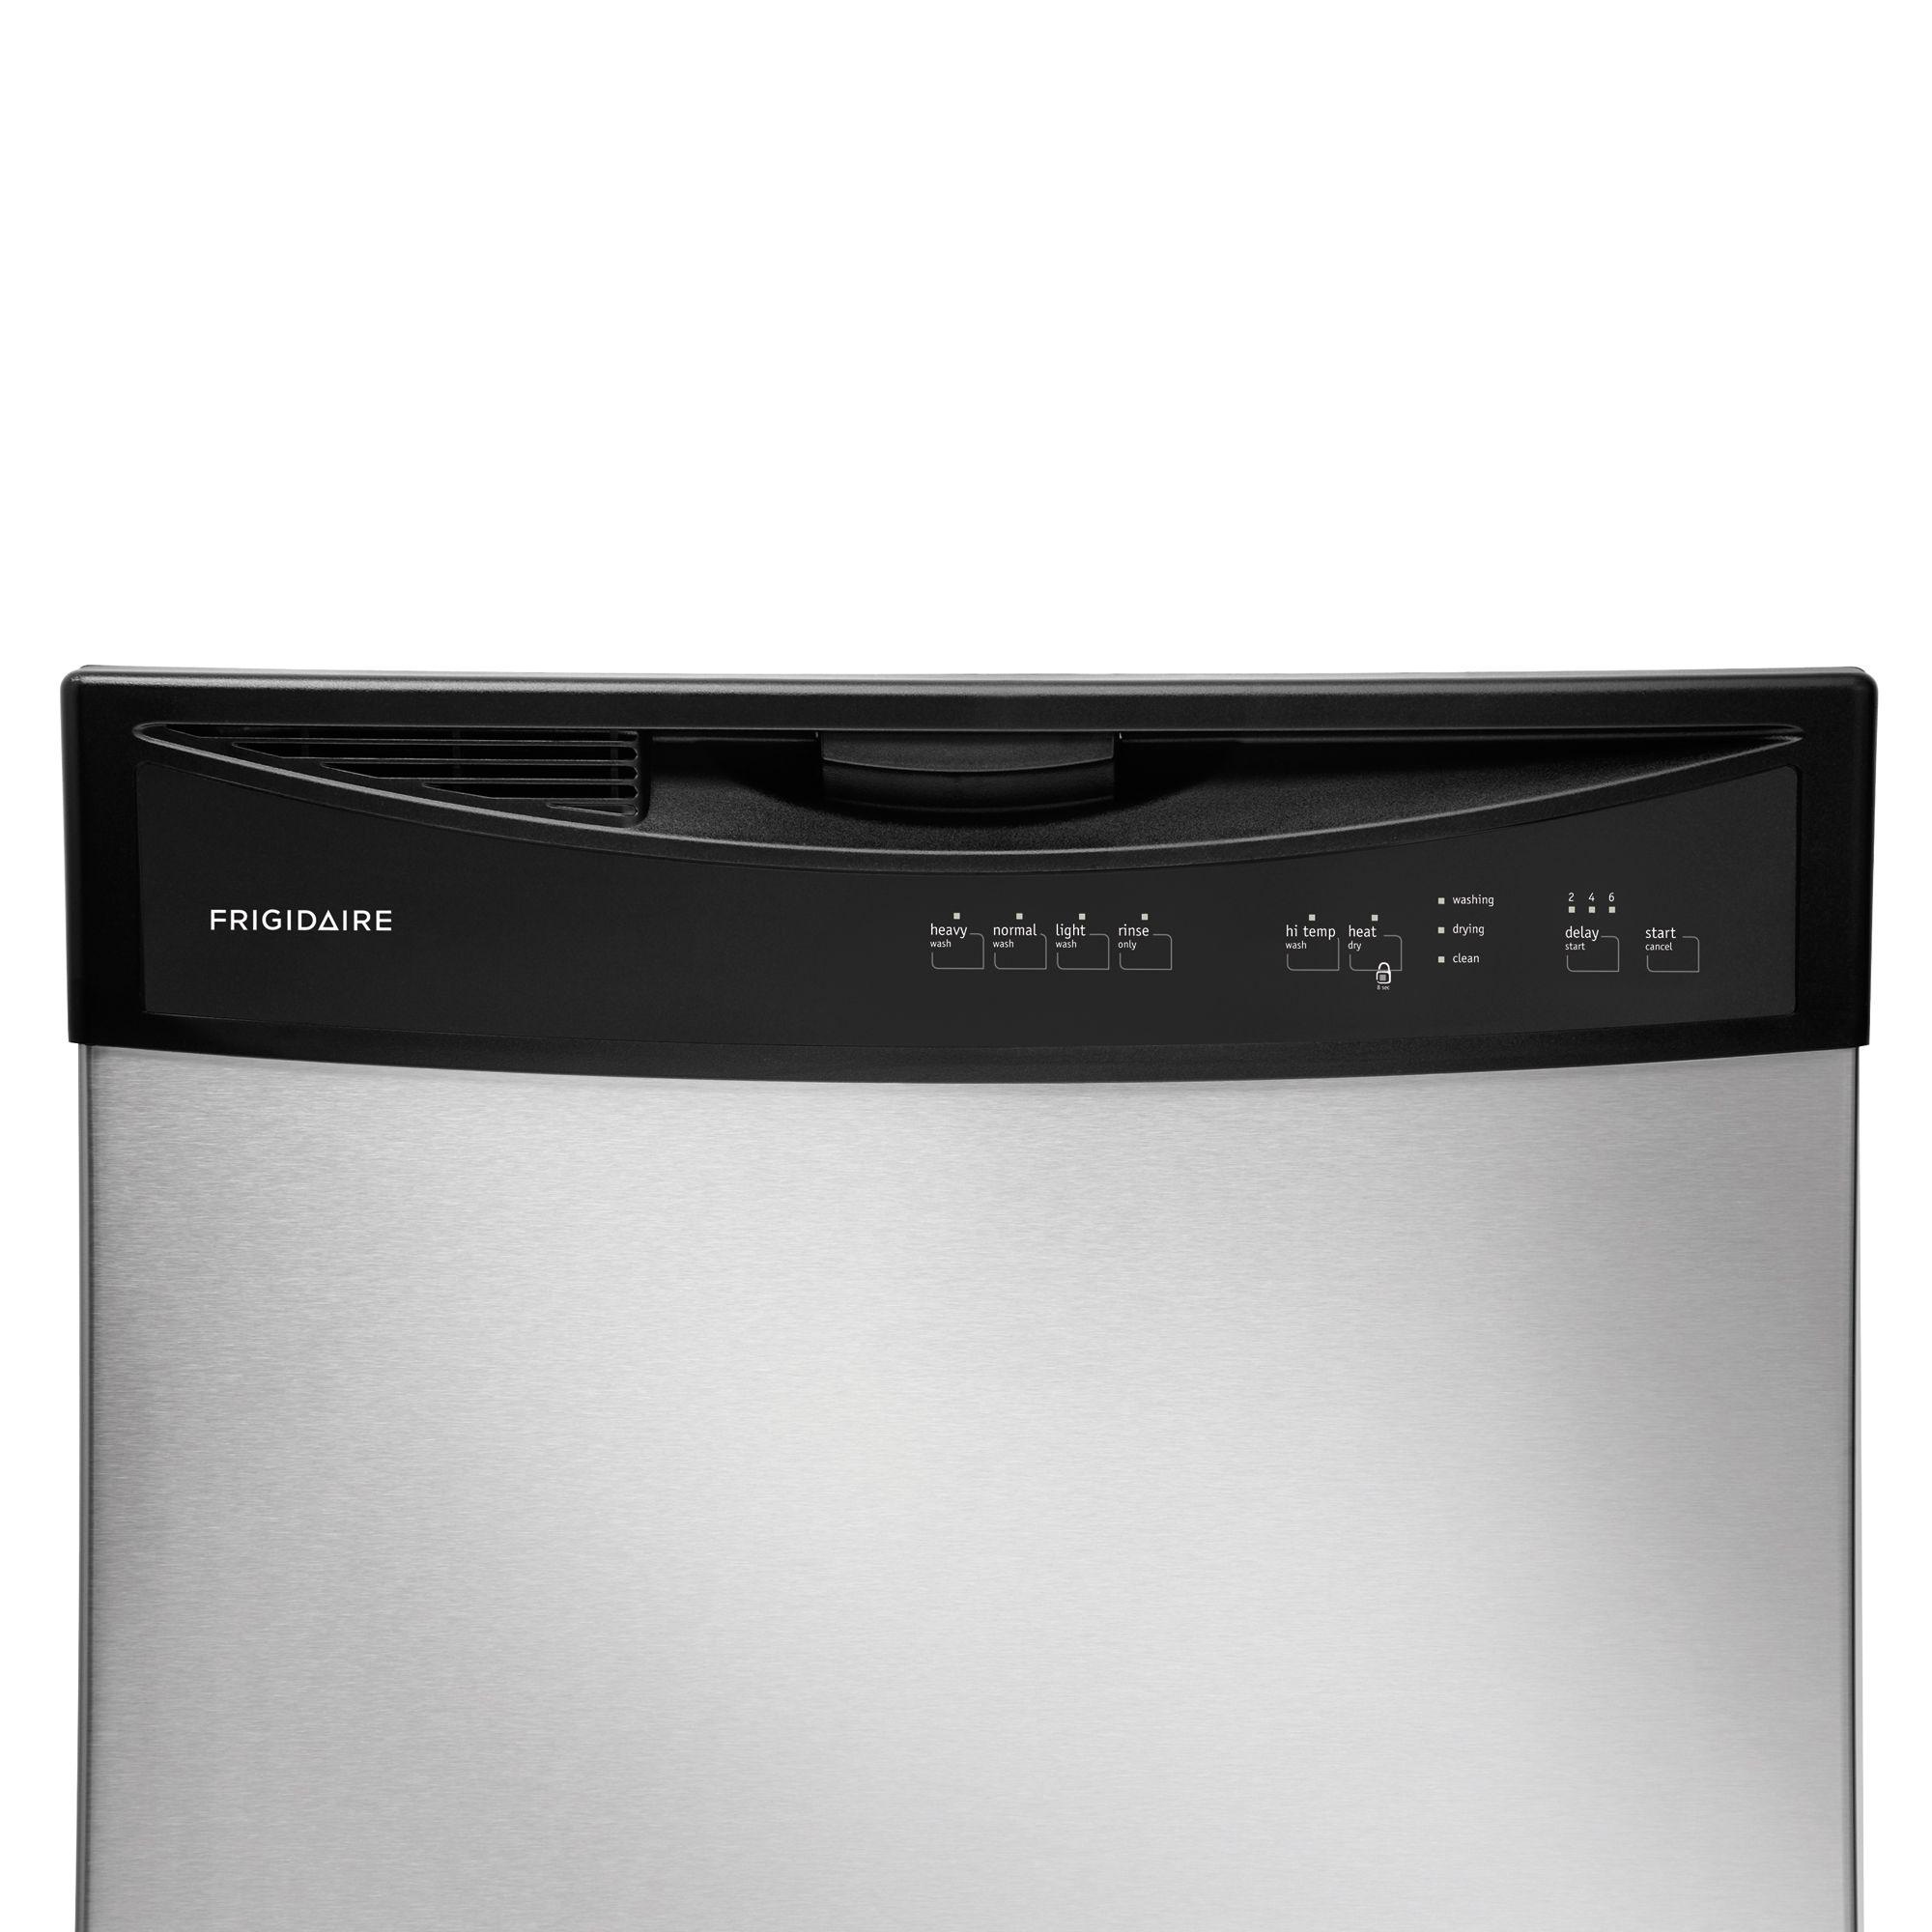 Frigidaire 24 in. Built-In Dishwasher